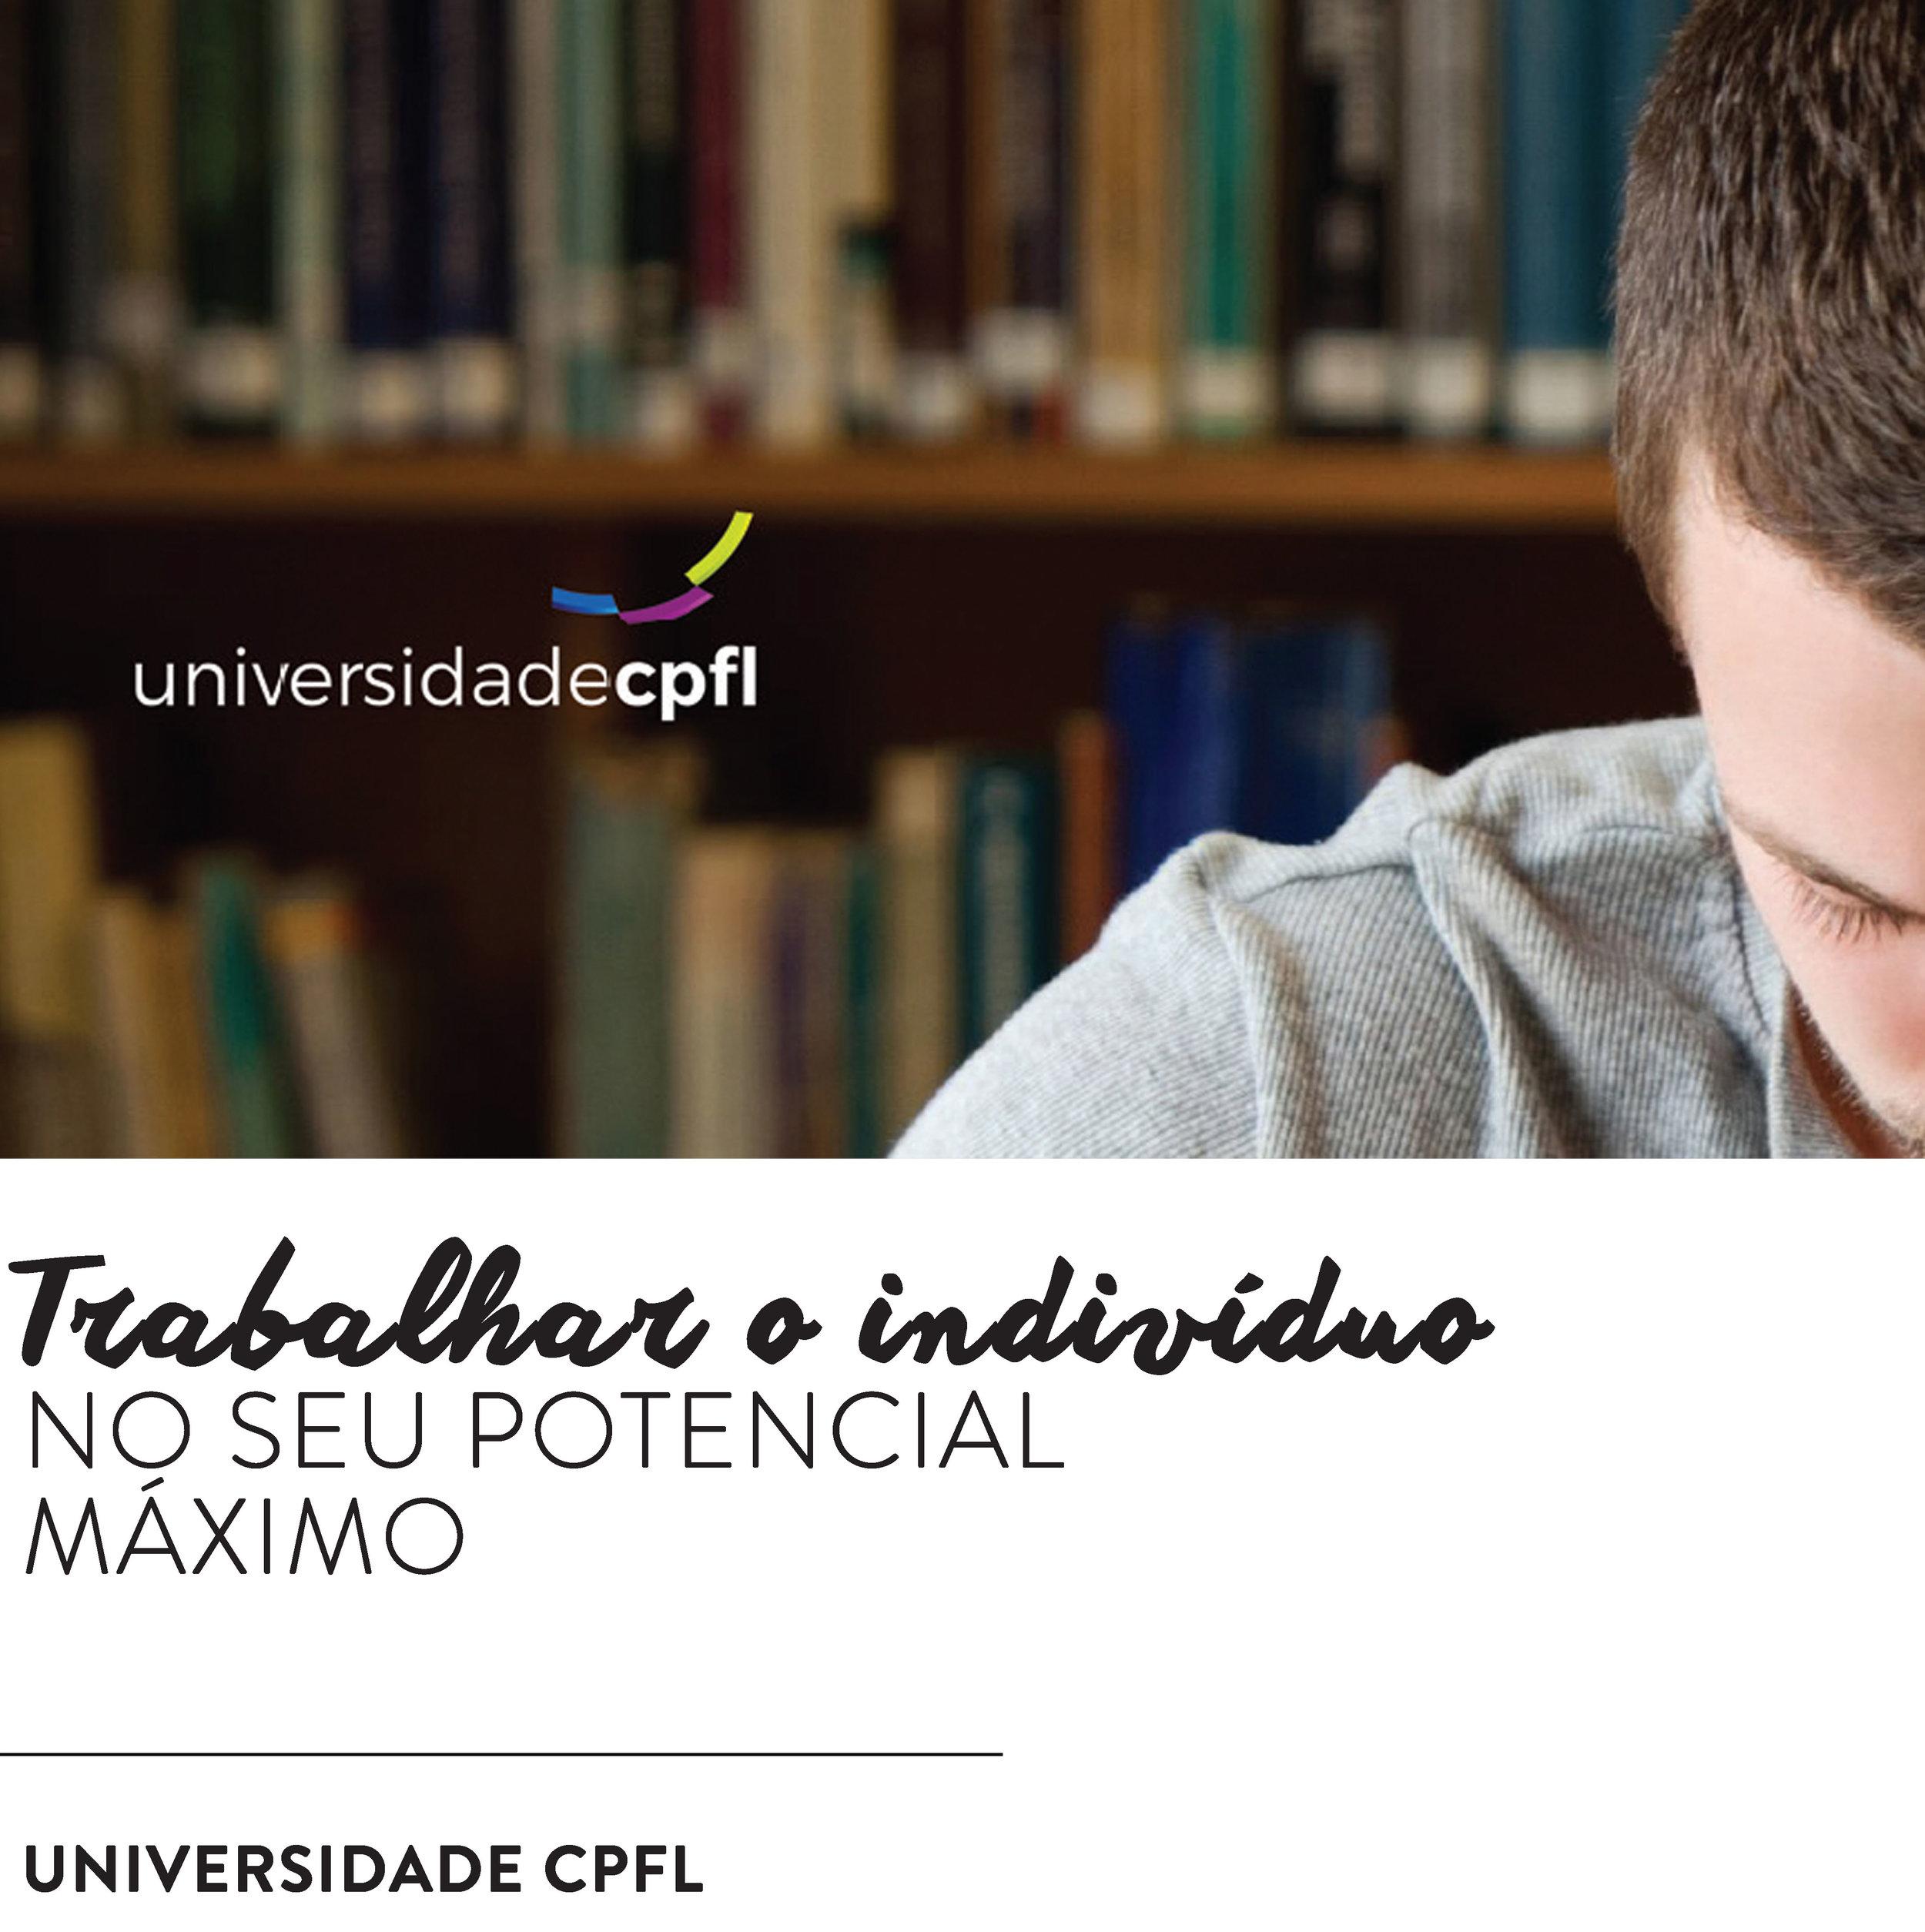 UCPFL.jpg